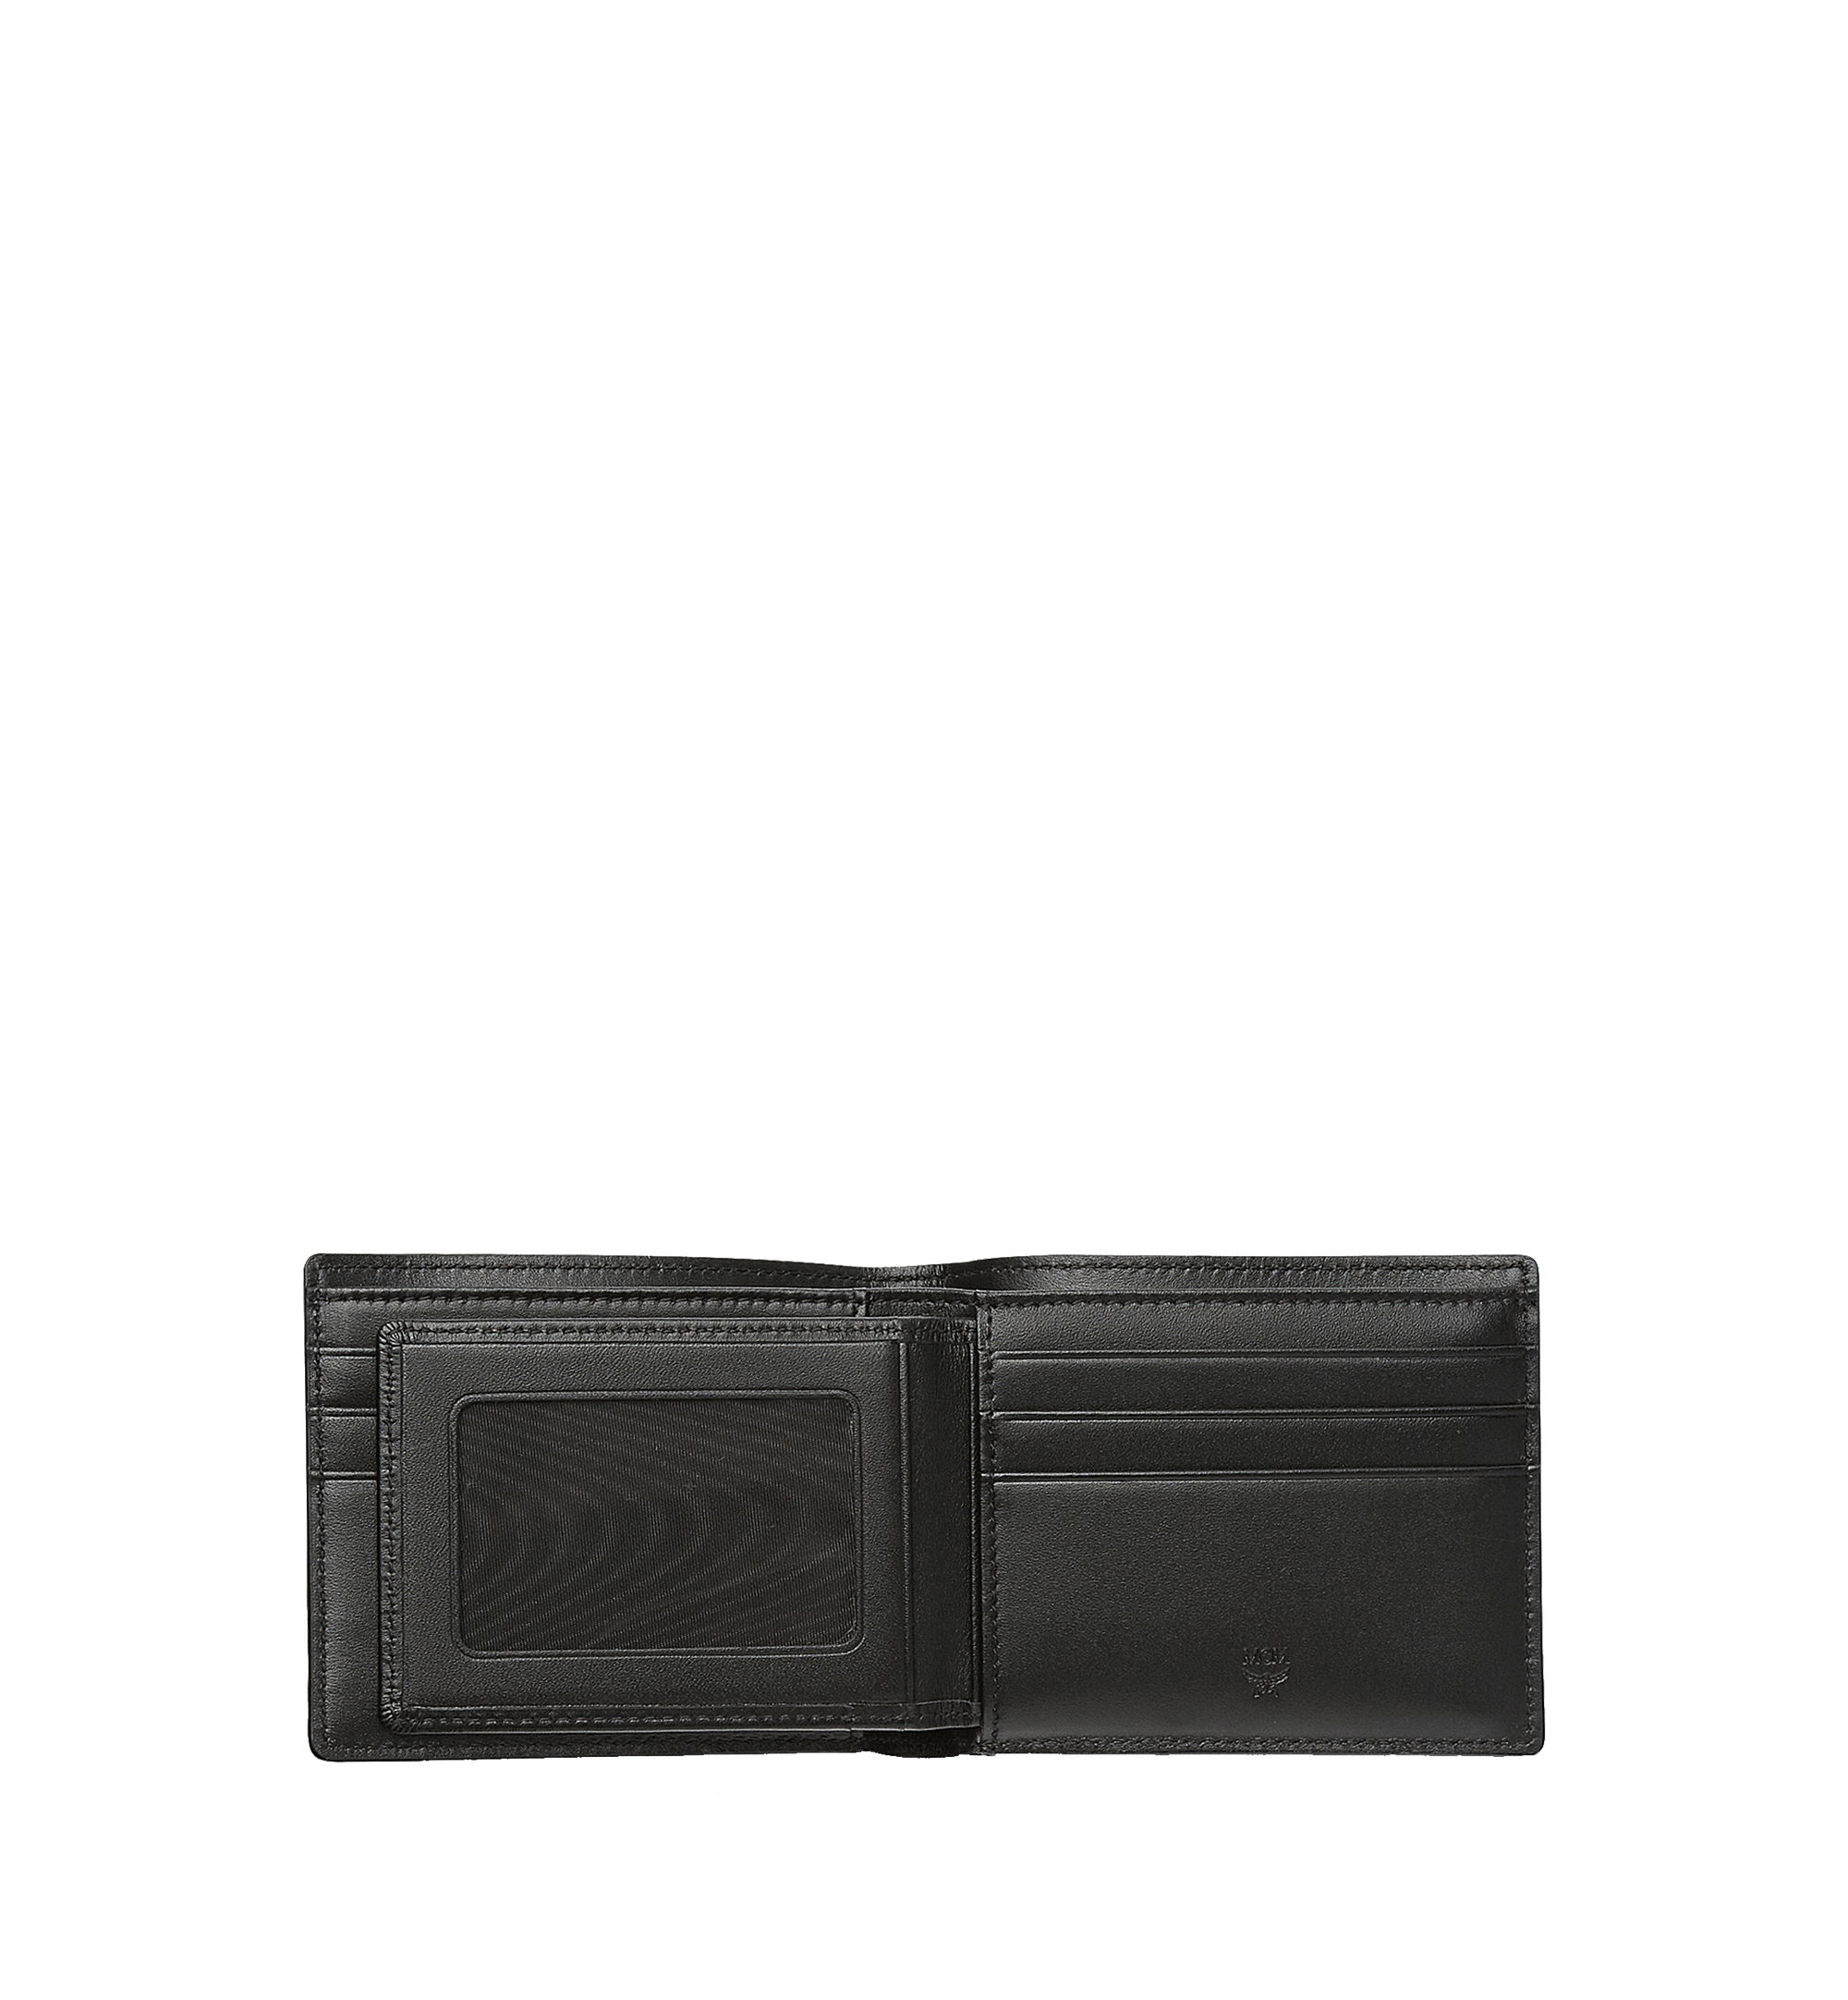 MCM Bifold Wallet with Card Case in Visetos Original Black MXSAAVI02BK001 Alternate View 2